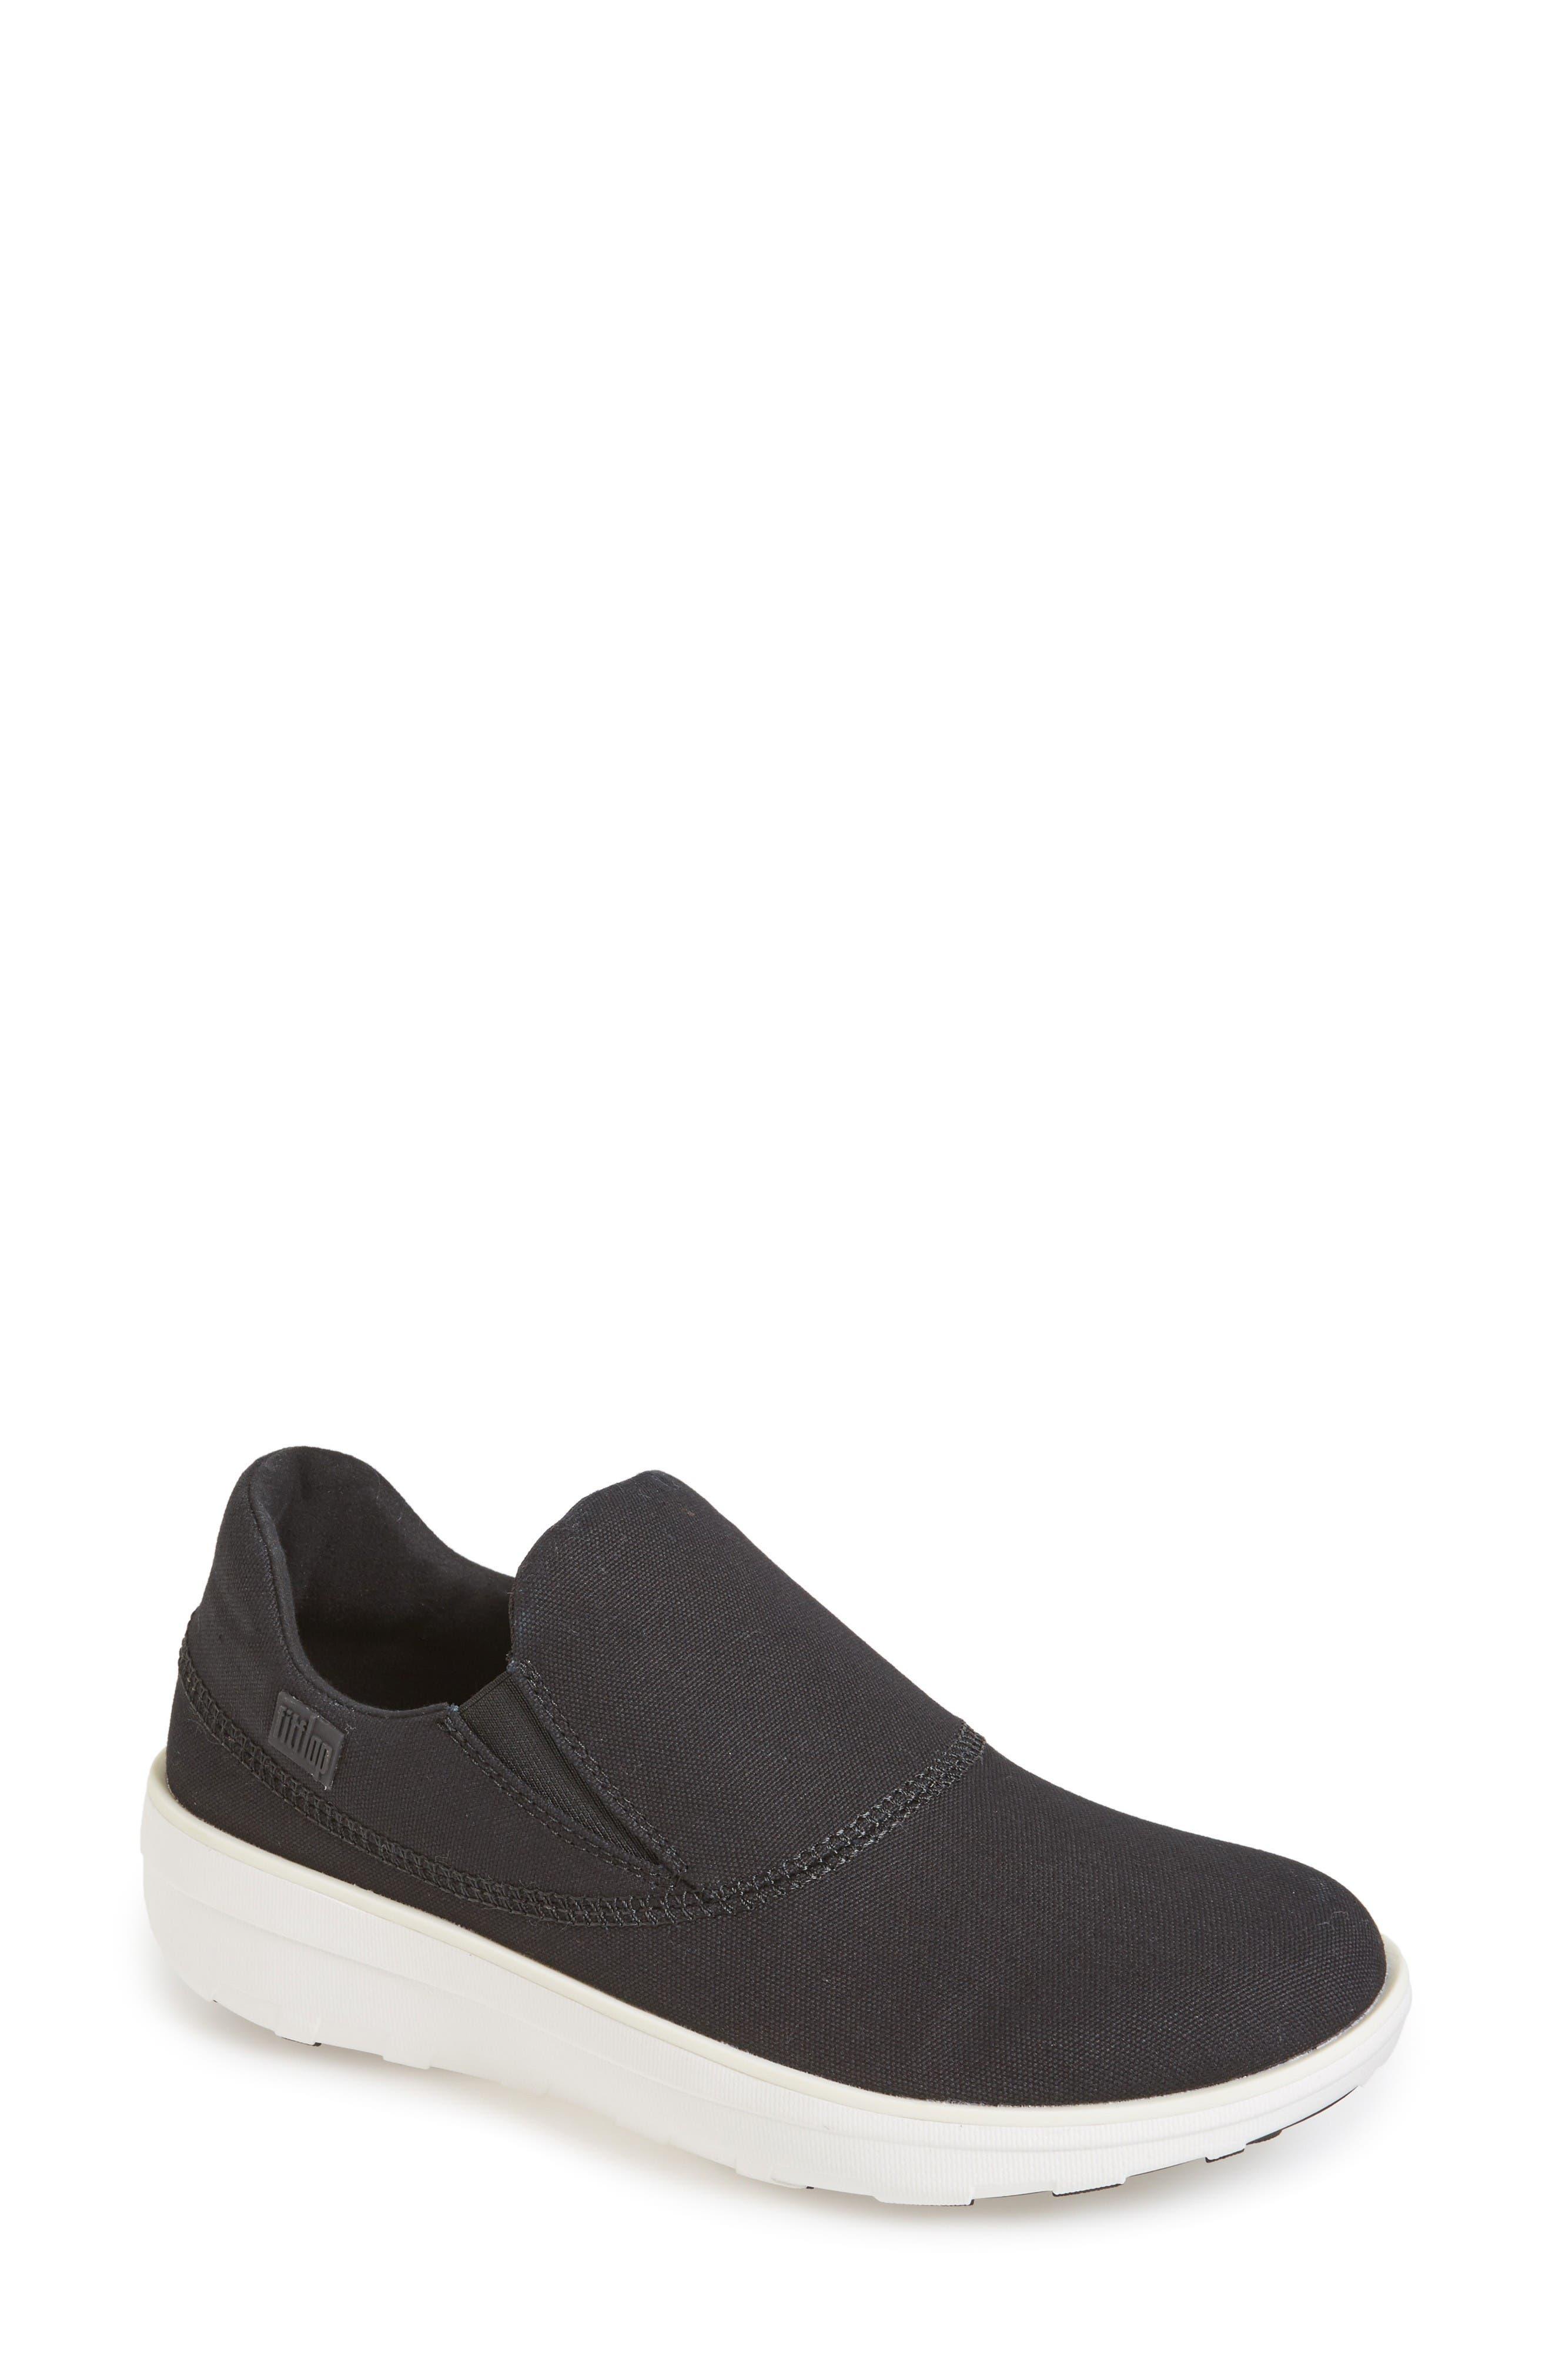 Alternate Image 1 Selected - FitFlop Loaff Slip-On Sneaker